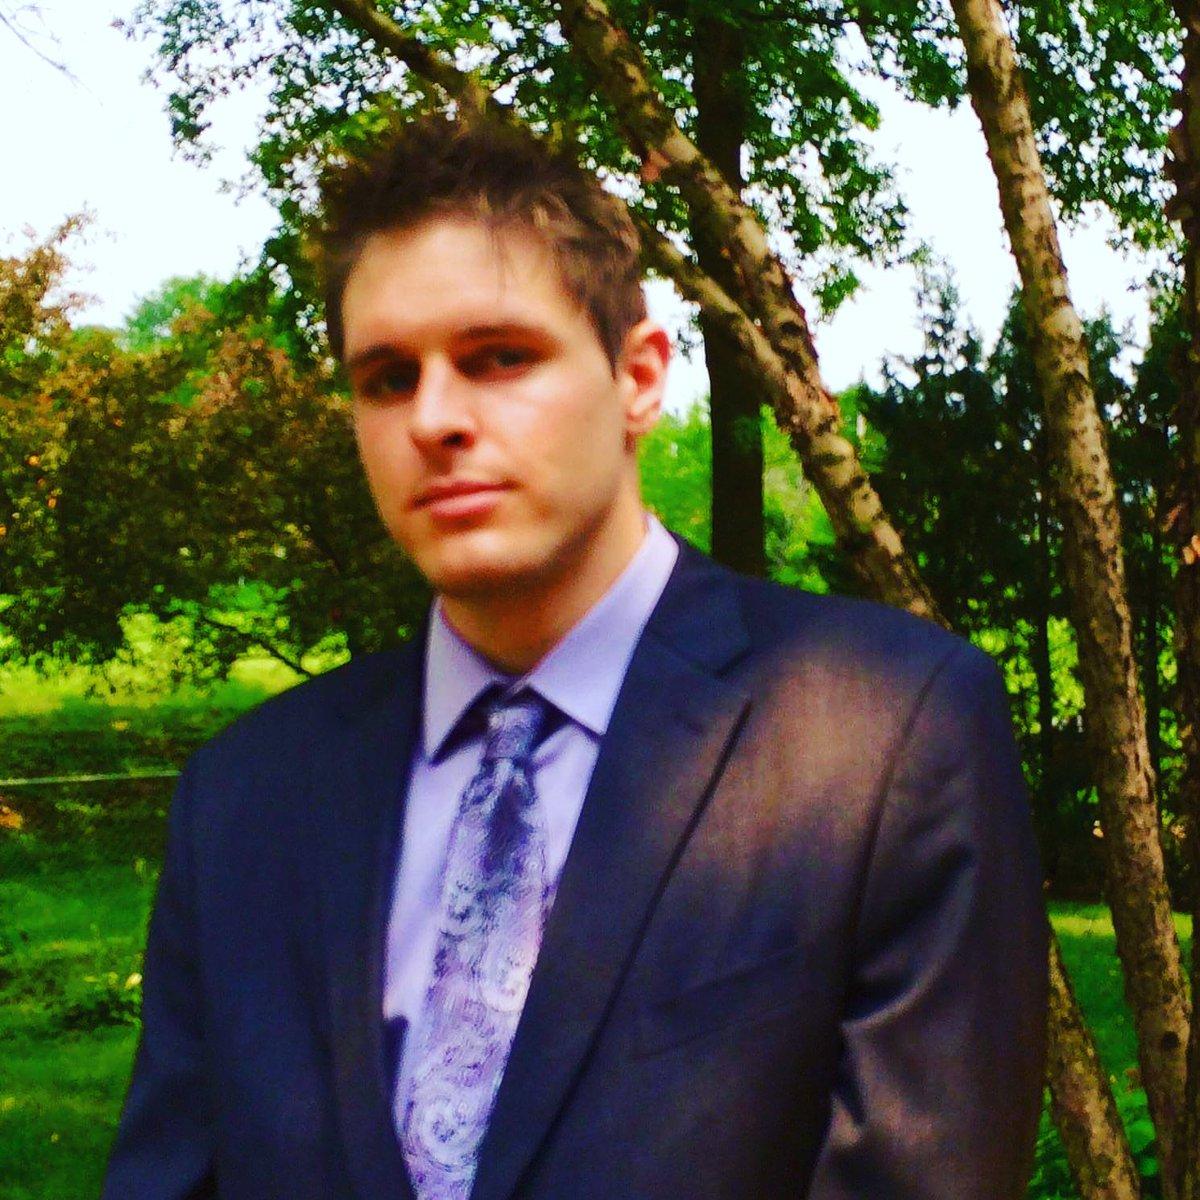 CEO of Murtha &amp; Burke Marketing~ :) #scrollforever #ifb  #blockchain #cryptocurrency #crypto #ethereum #trapadrive #fintech #bitcoin #investments #altcoin #eth #btc #RT #ICO #ripple #xmr #reddit #zec #f4f #bitnews #wsj #news #redditBitcoin #freebitcoin #robotcoingame #bitcointalk<br>http://pic.twitter.com/UL1qbk57Yg